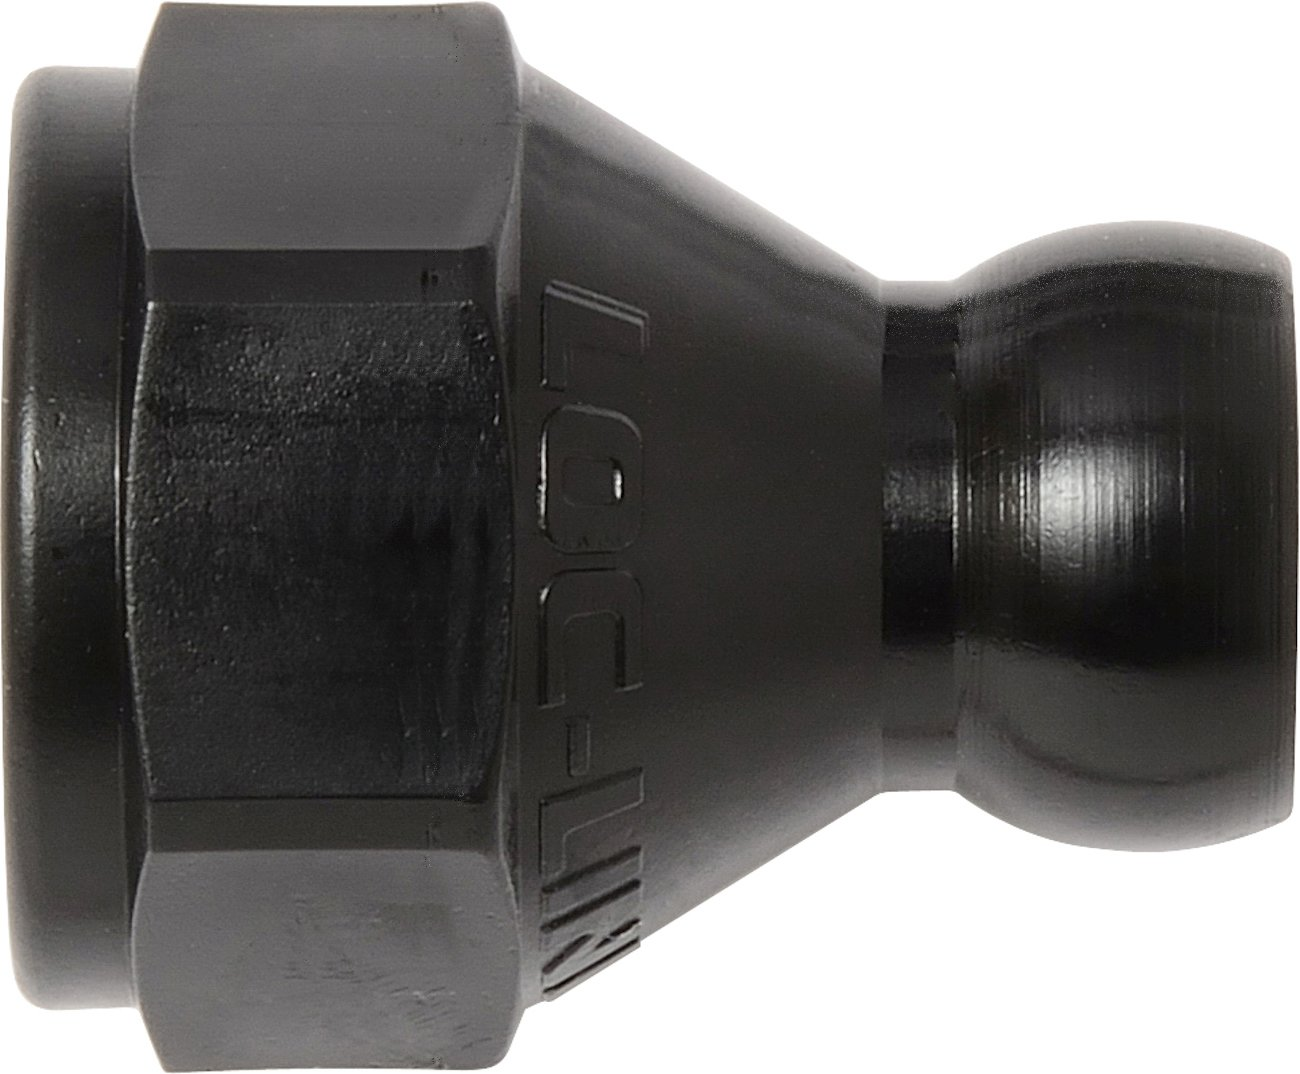 1//2 Hose ID Adapter Gray Acetal Copolymer Loc-Line Coolant Hose Component 1//2-1//4 Diameter Pack of 20